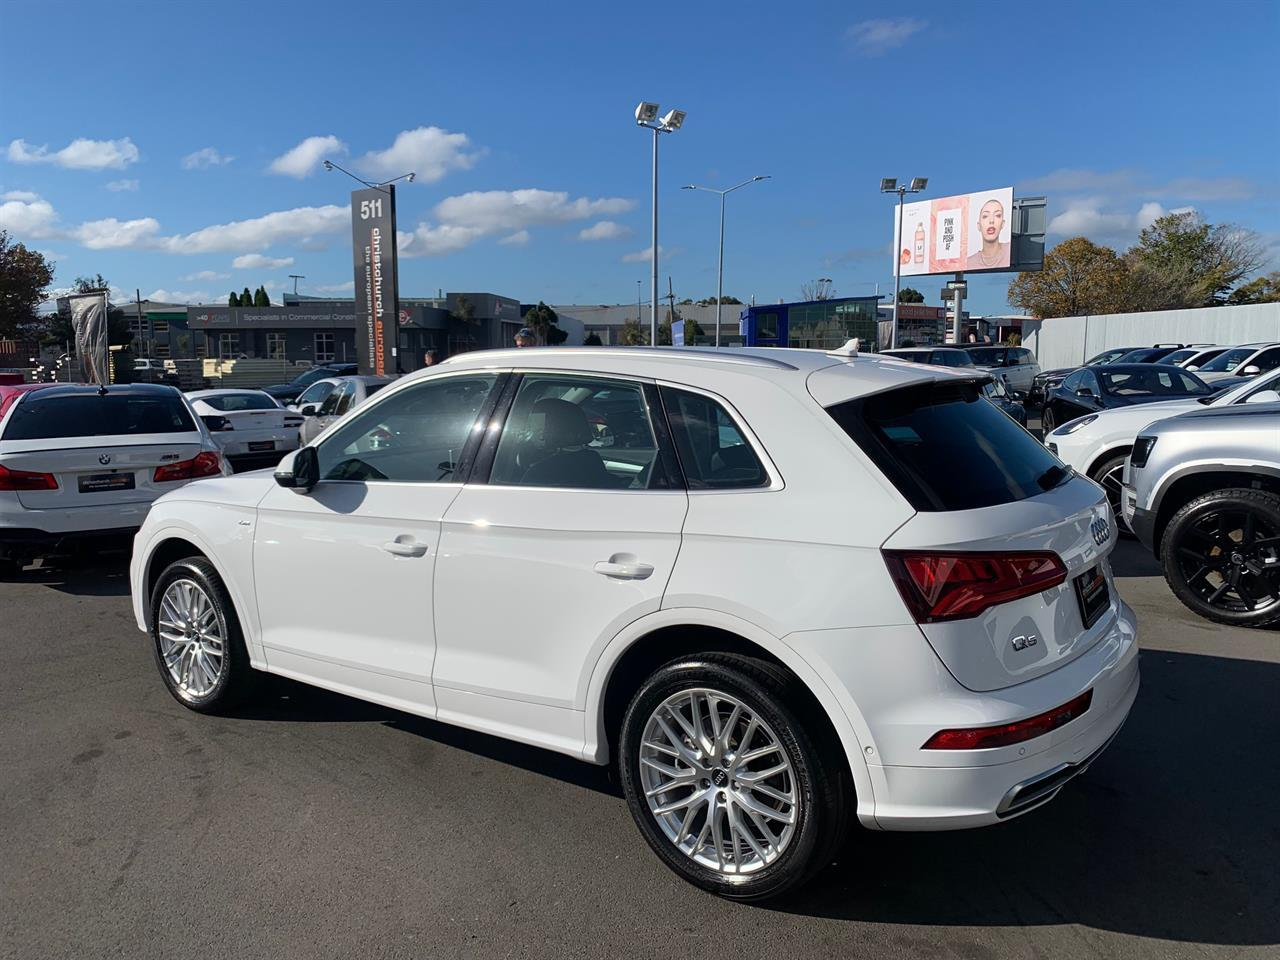 image-2, 2017 Audi Q5 2.0T FSI New Model Quattro at Christchurch